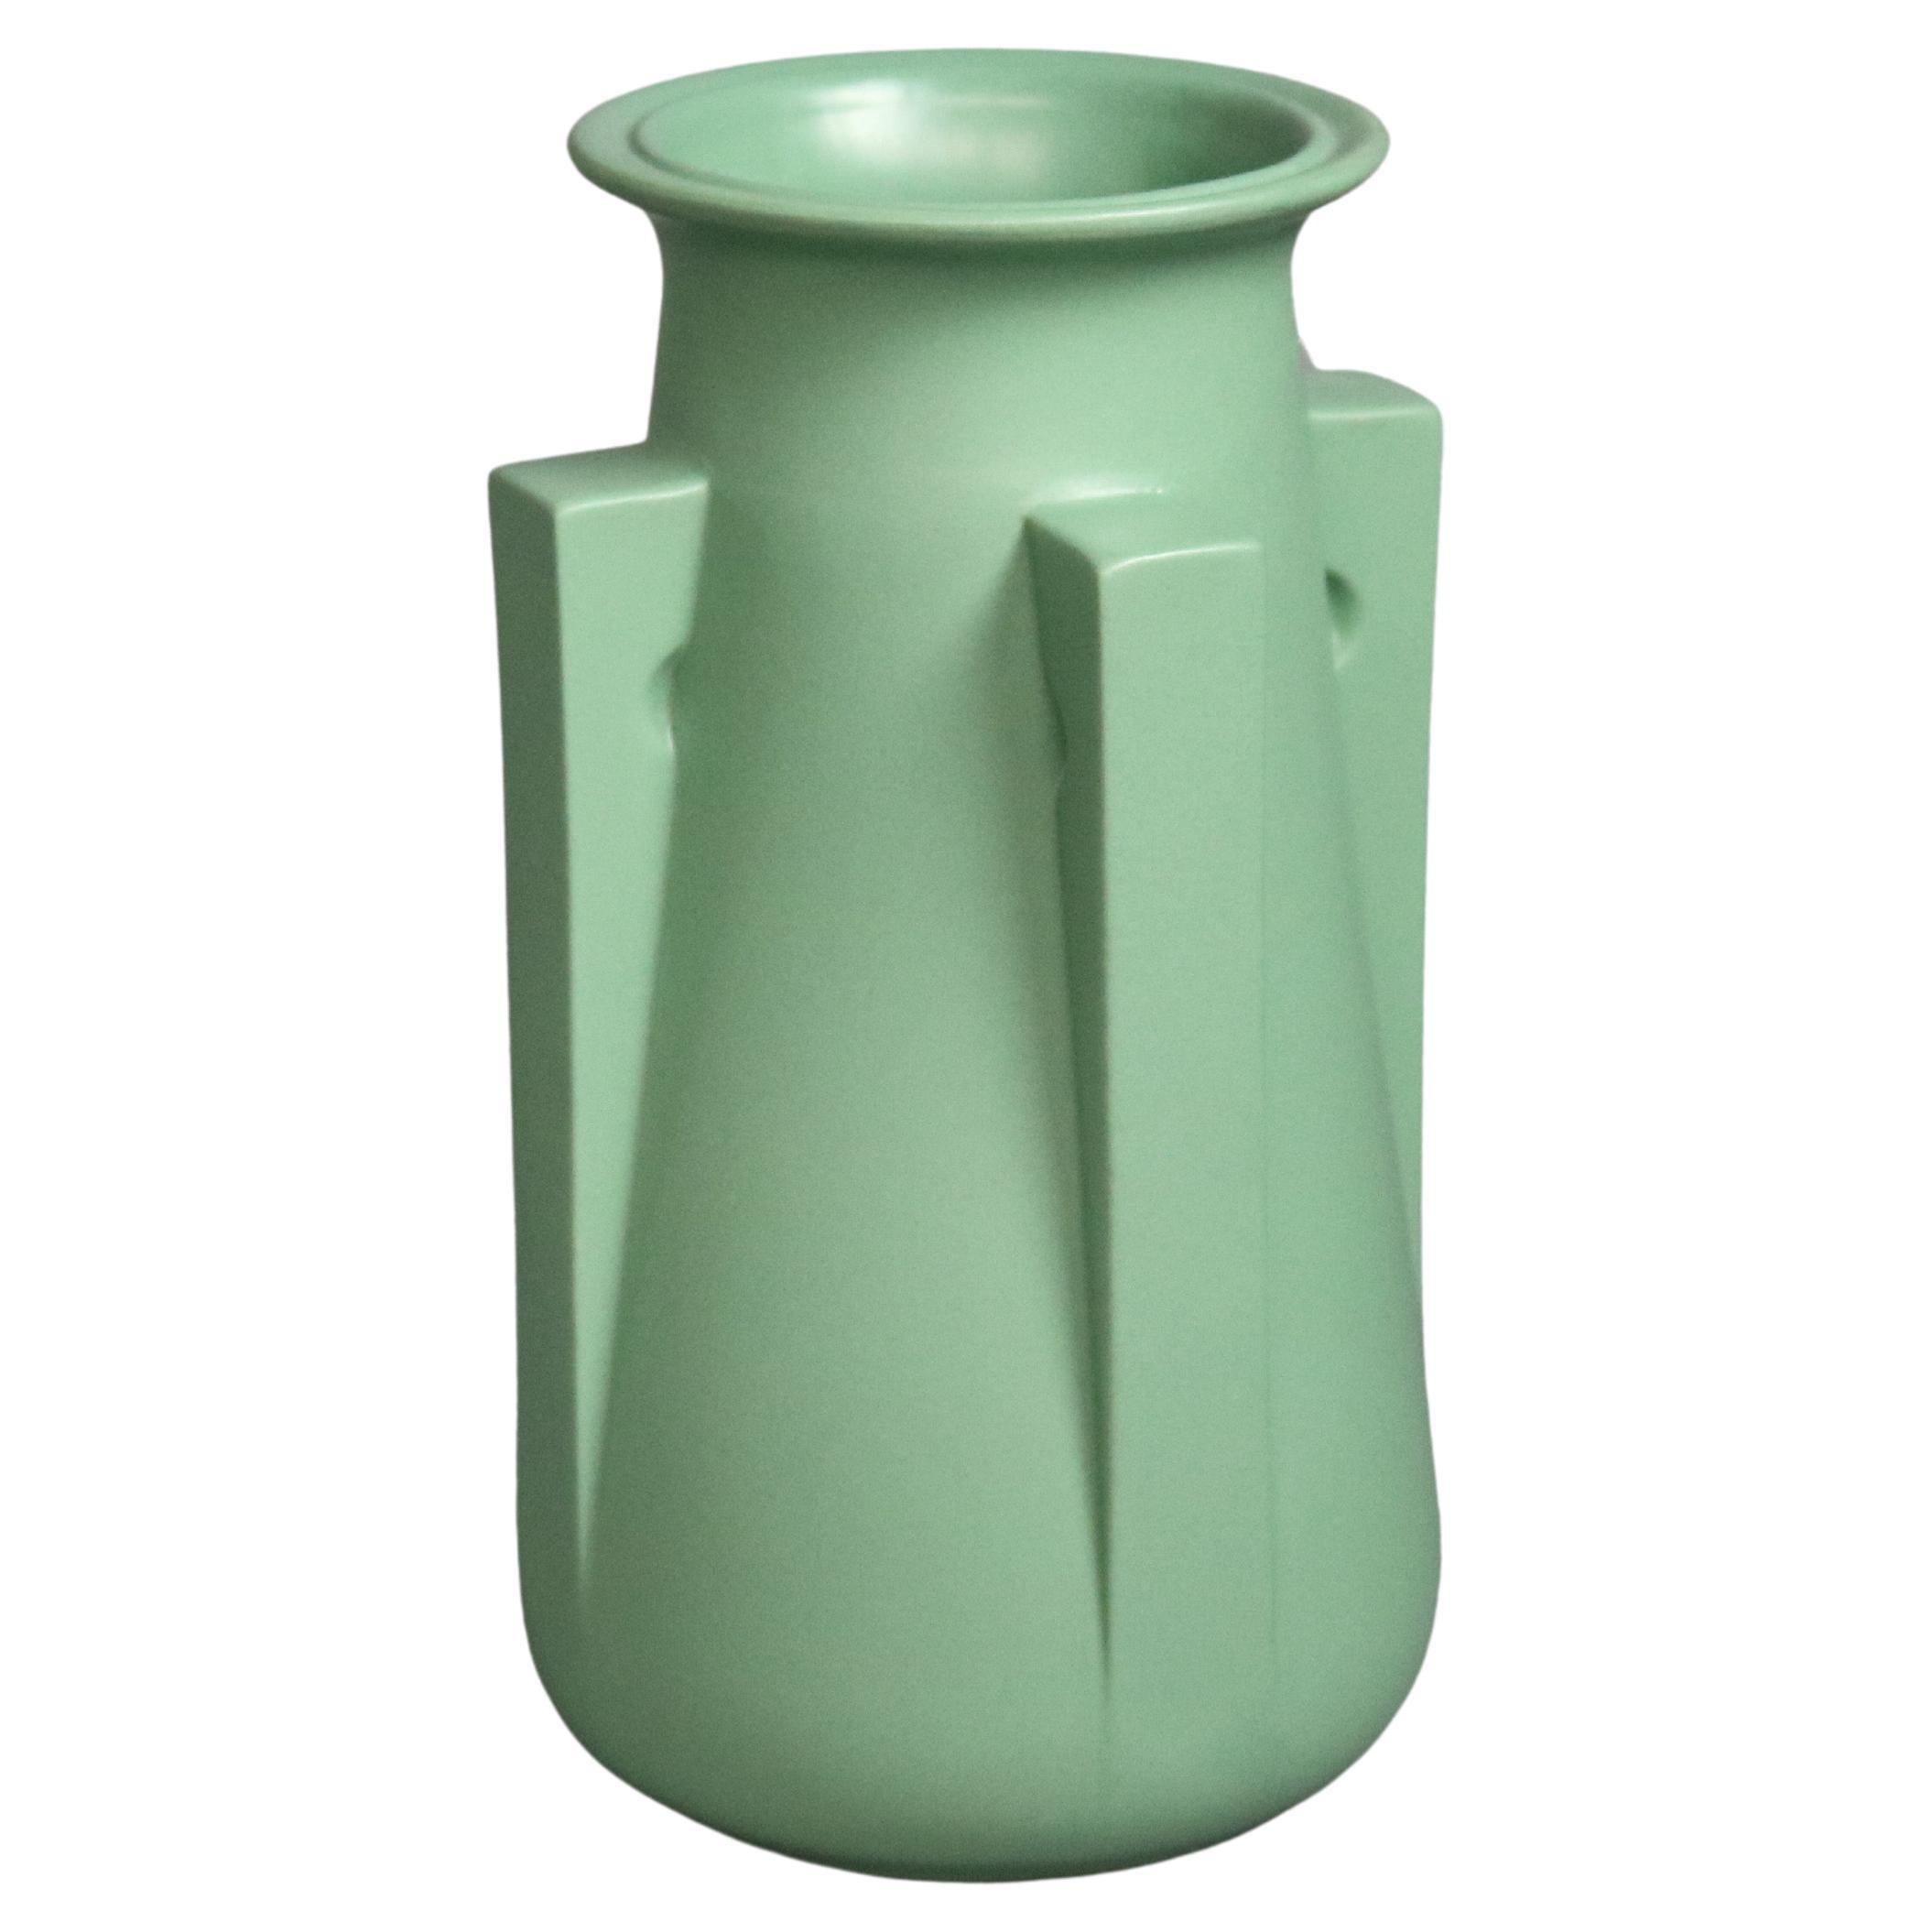 Teco Matt Green Four Buttress Art Pottery Vase 20th C